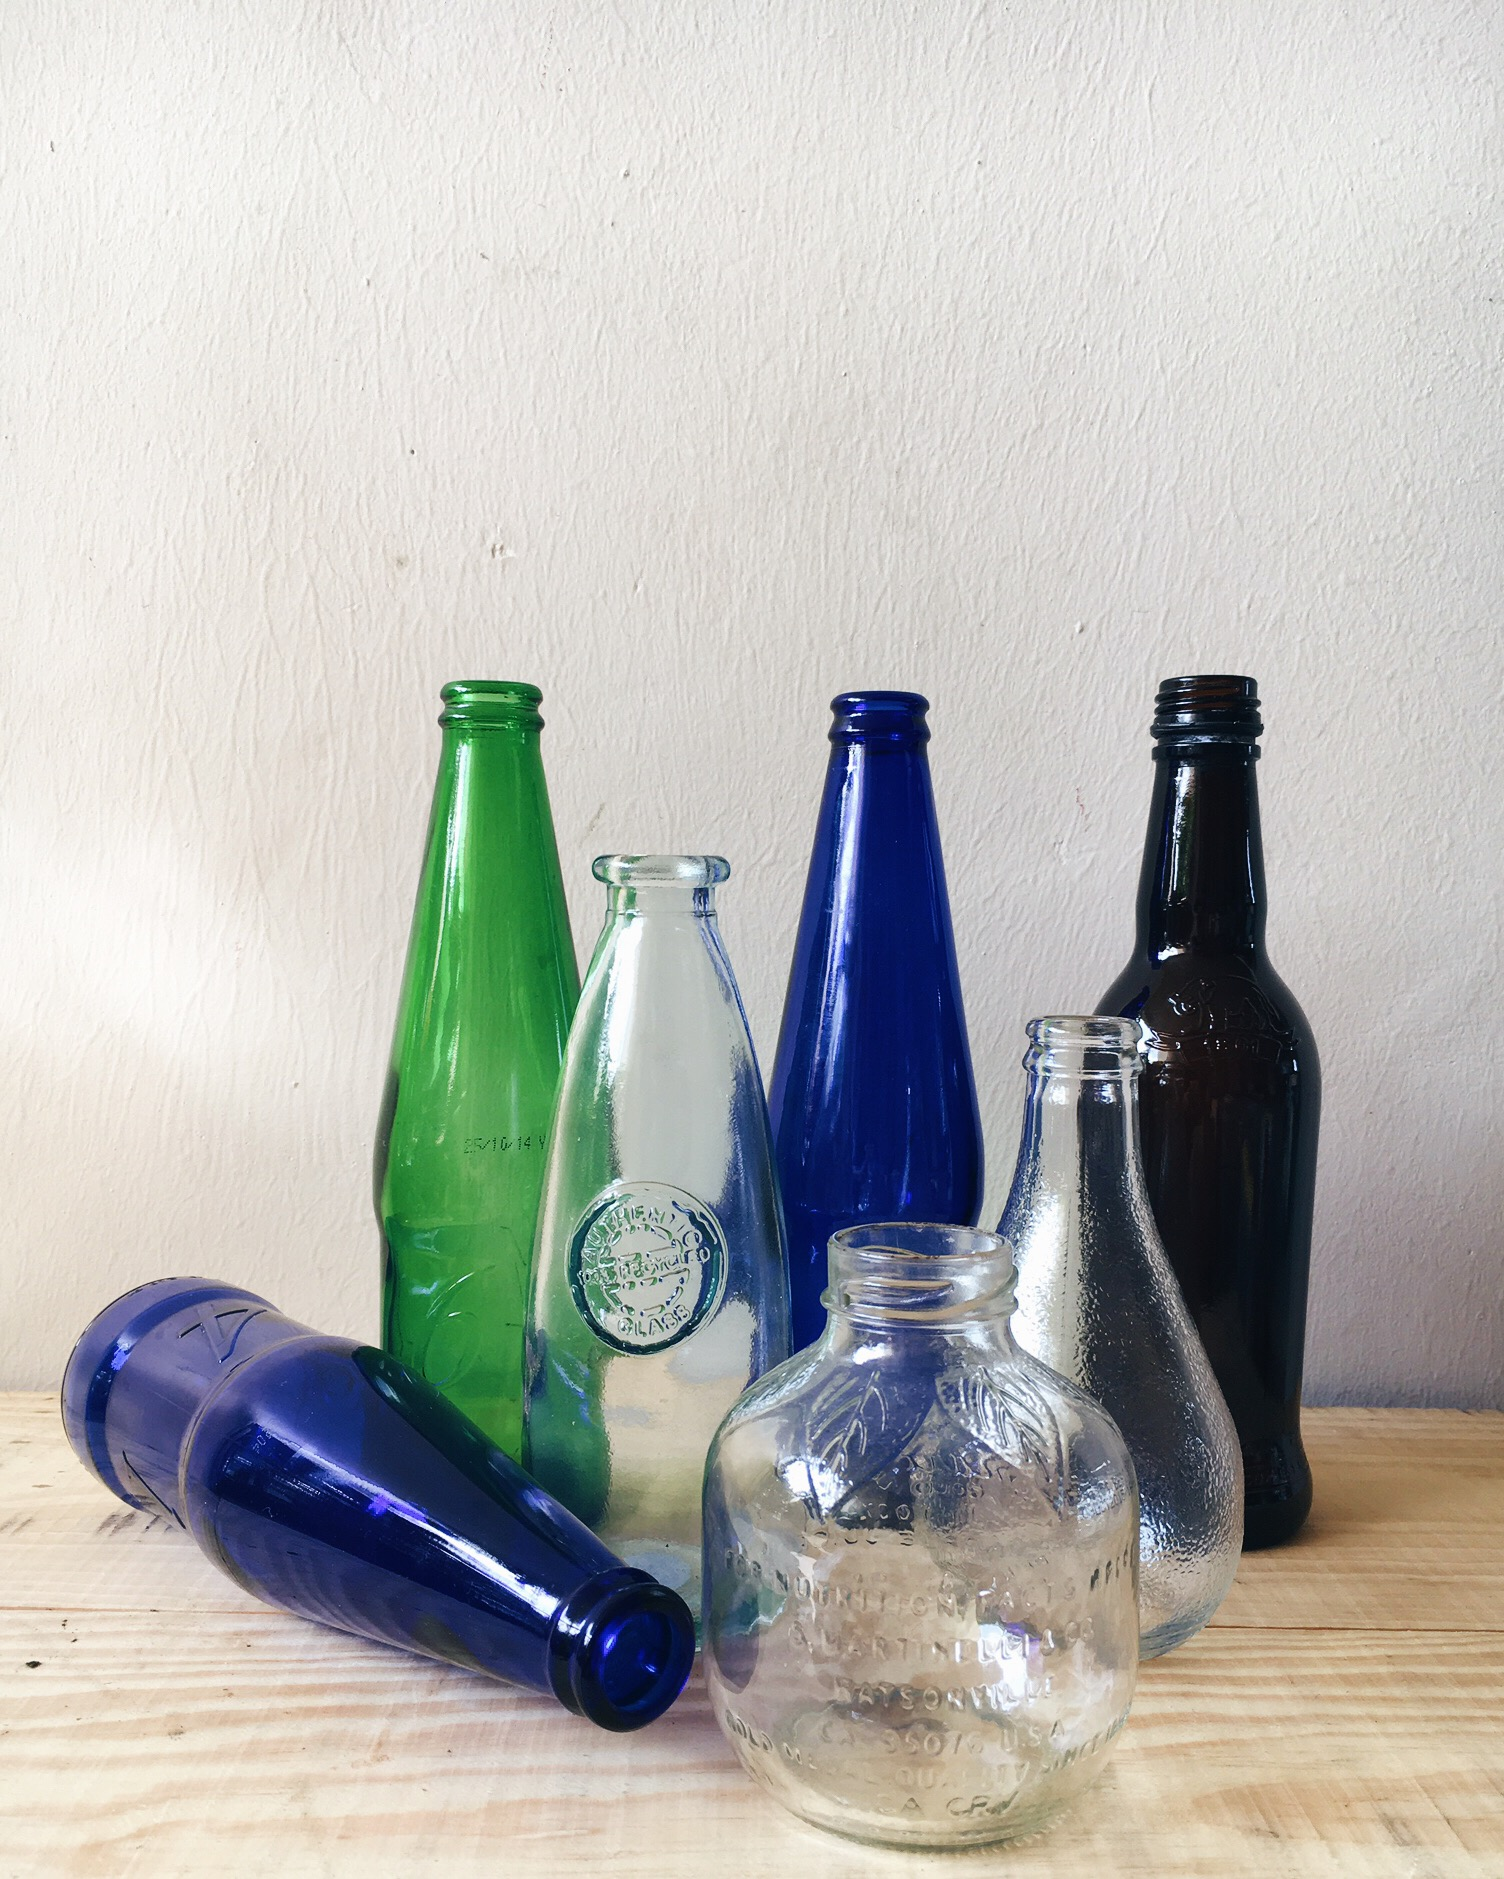 glassware beer bottles 2.JPG